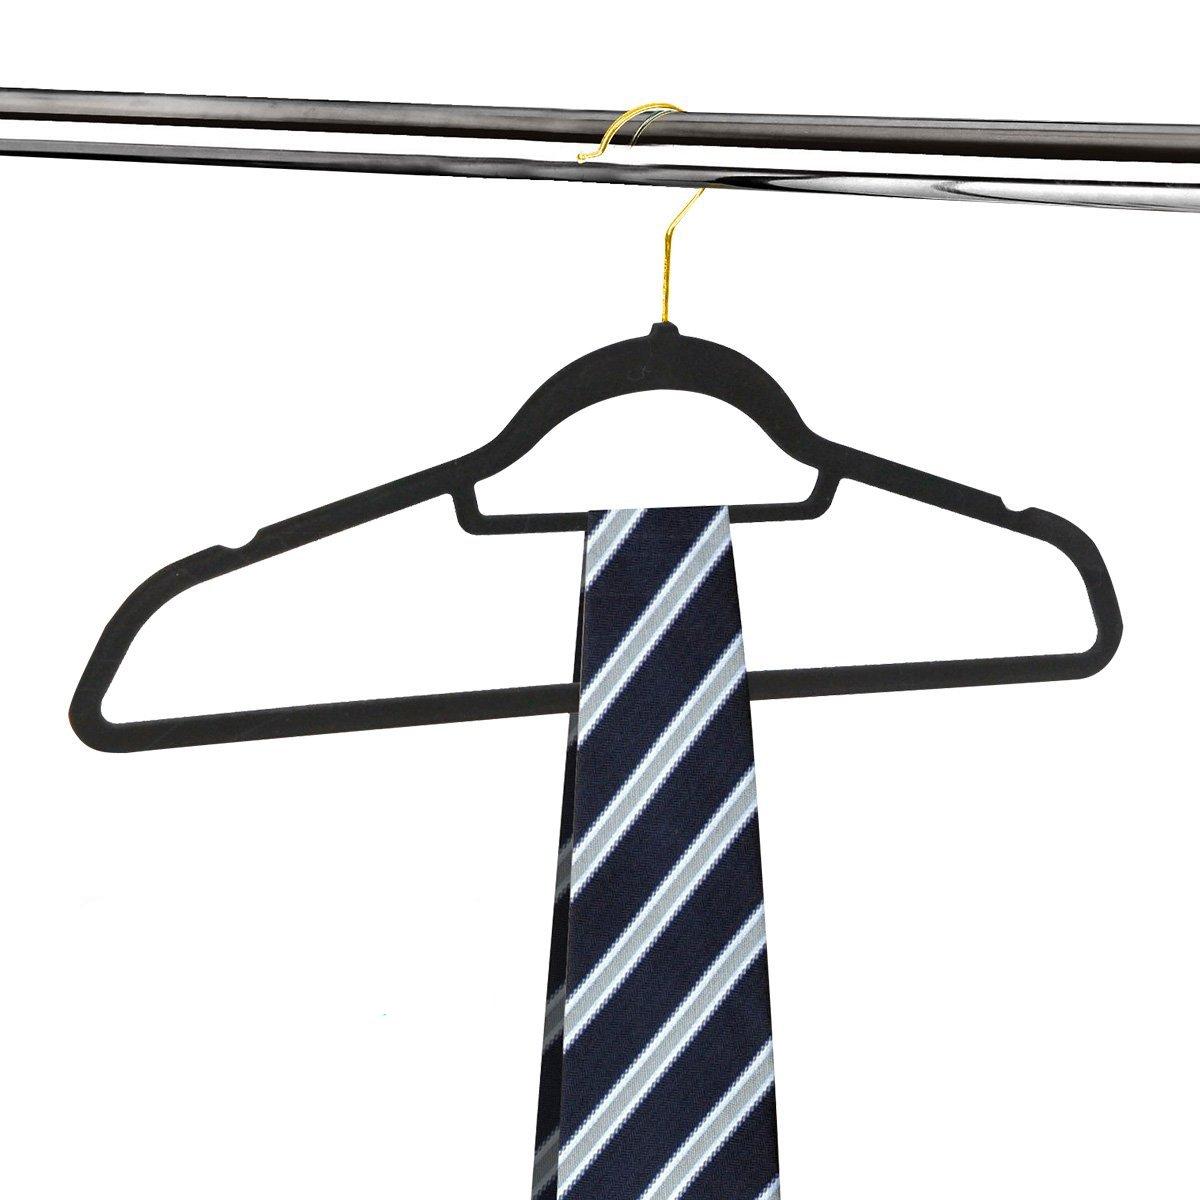 velvet clothes hangers follow - HD1200×1200